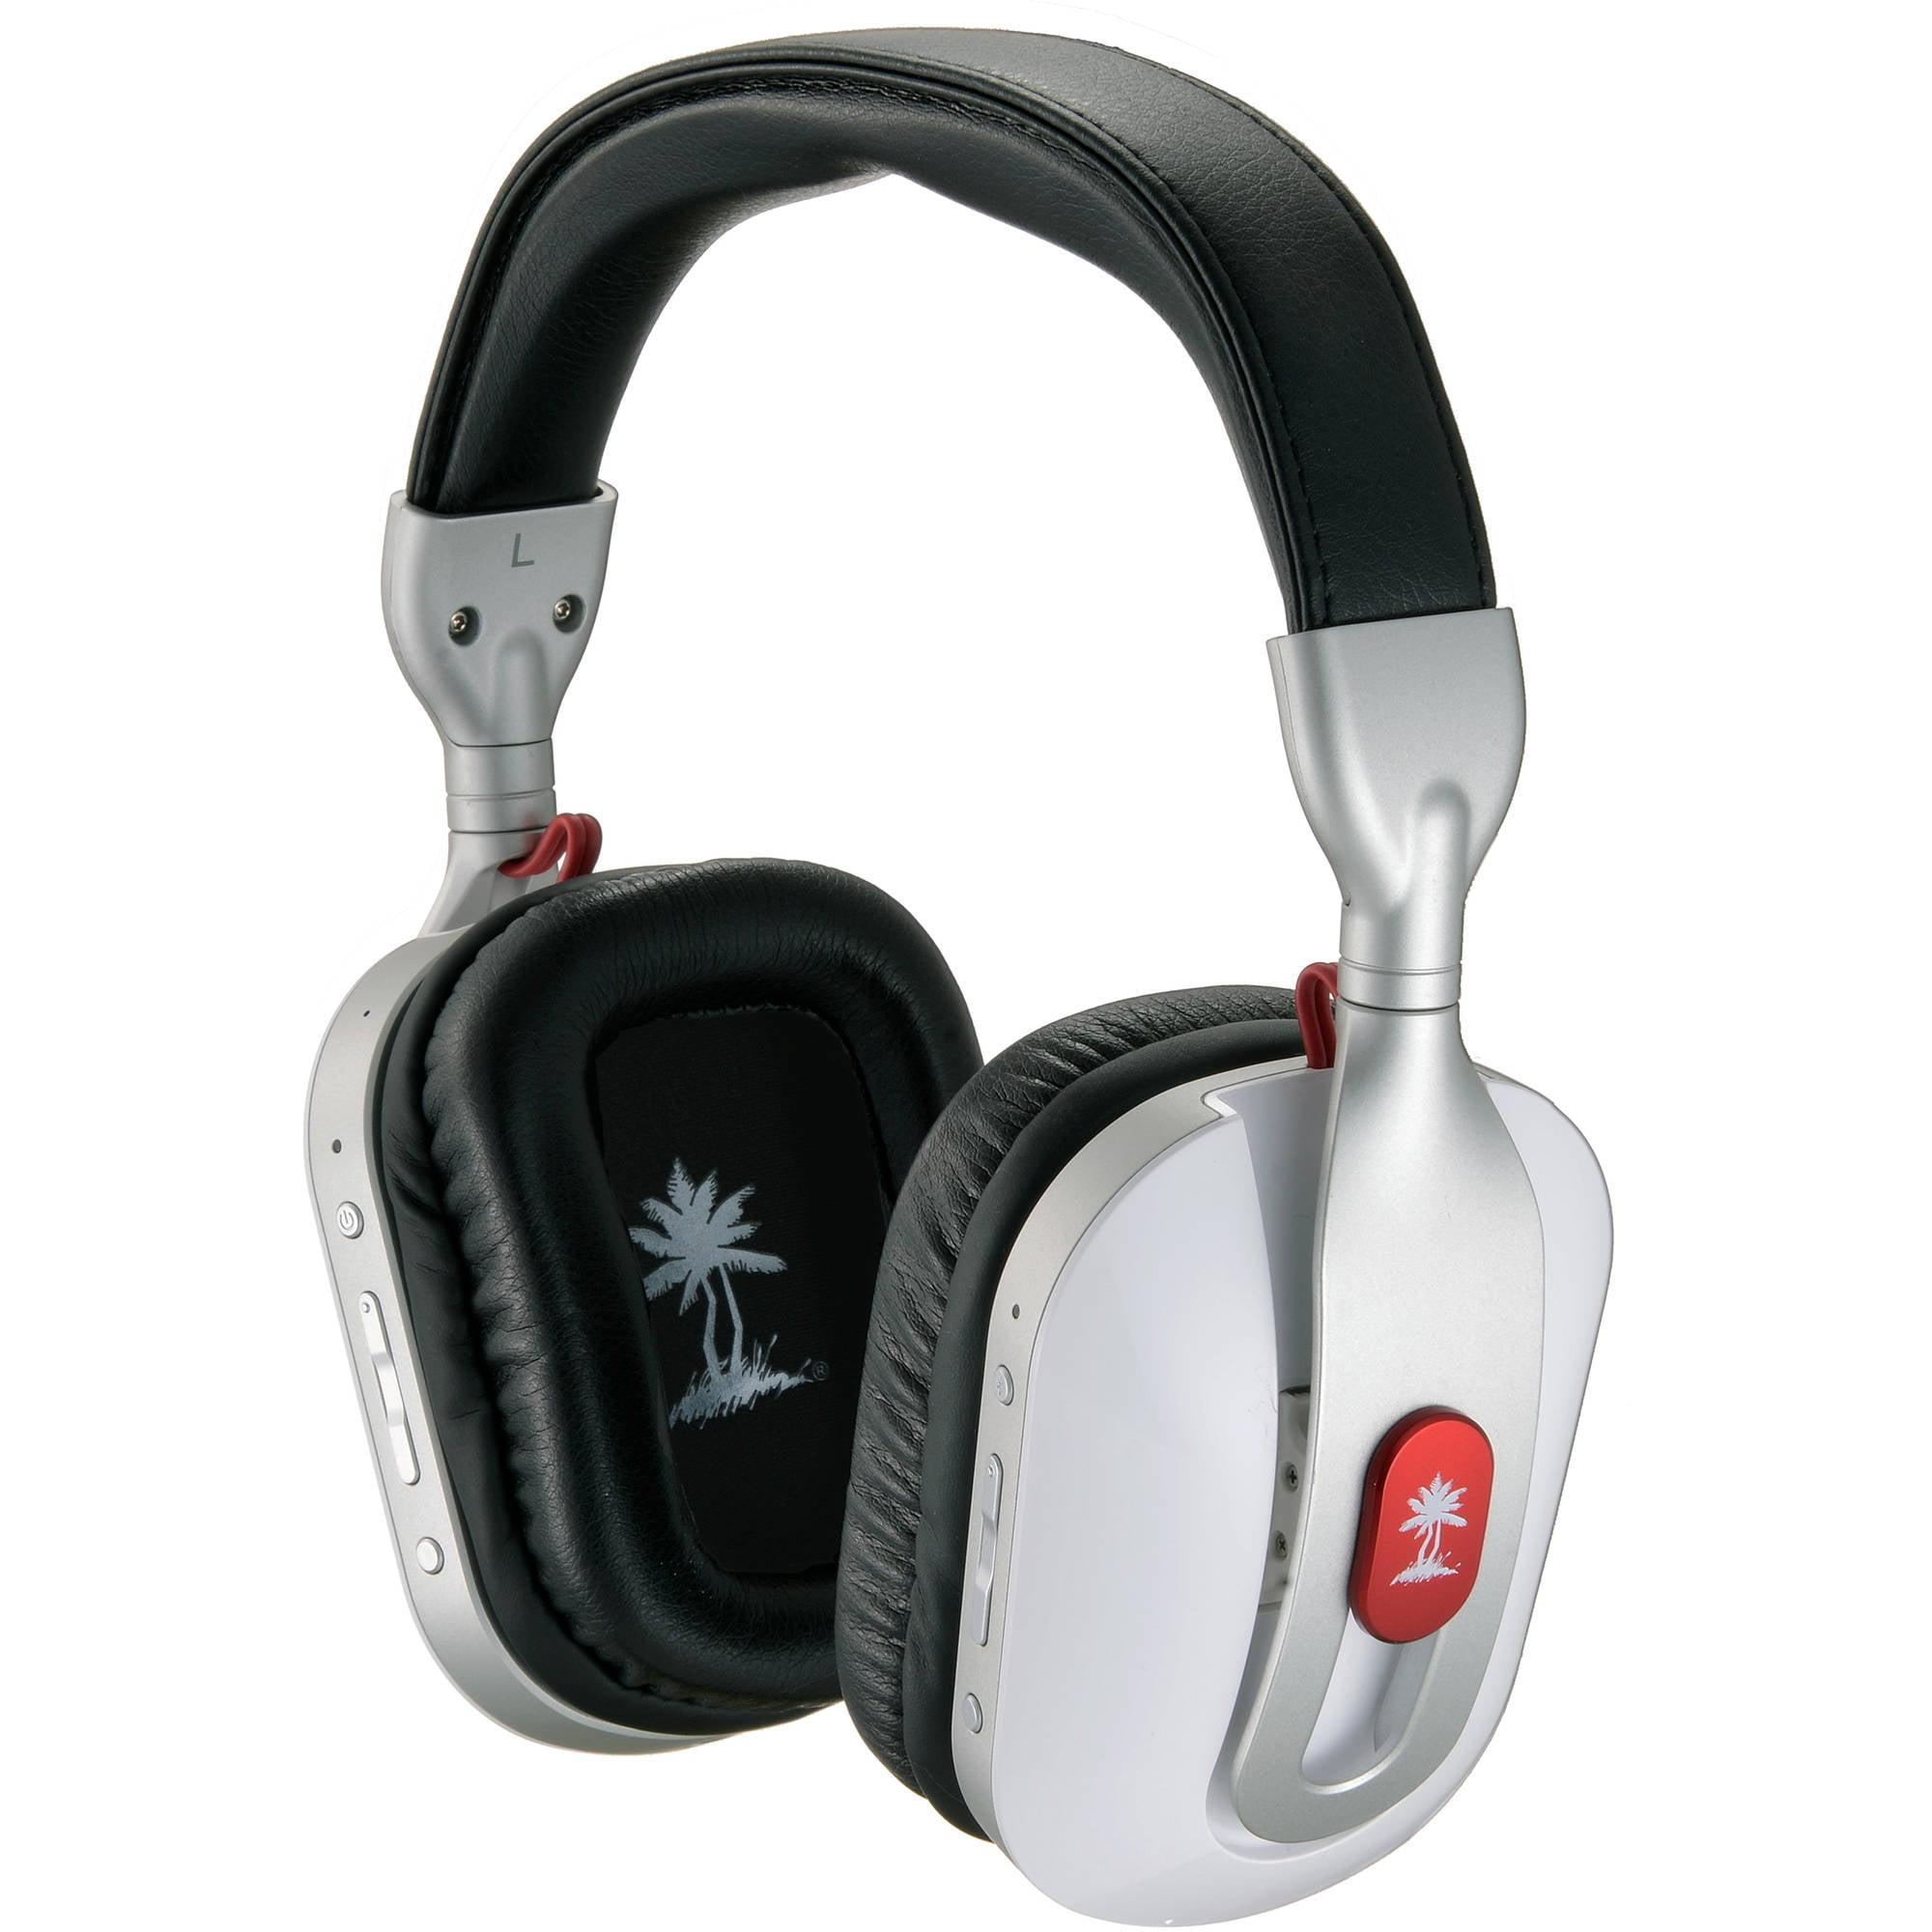 Turtle Beach i30 Bluetooth Noise-Canceling Headset